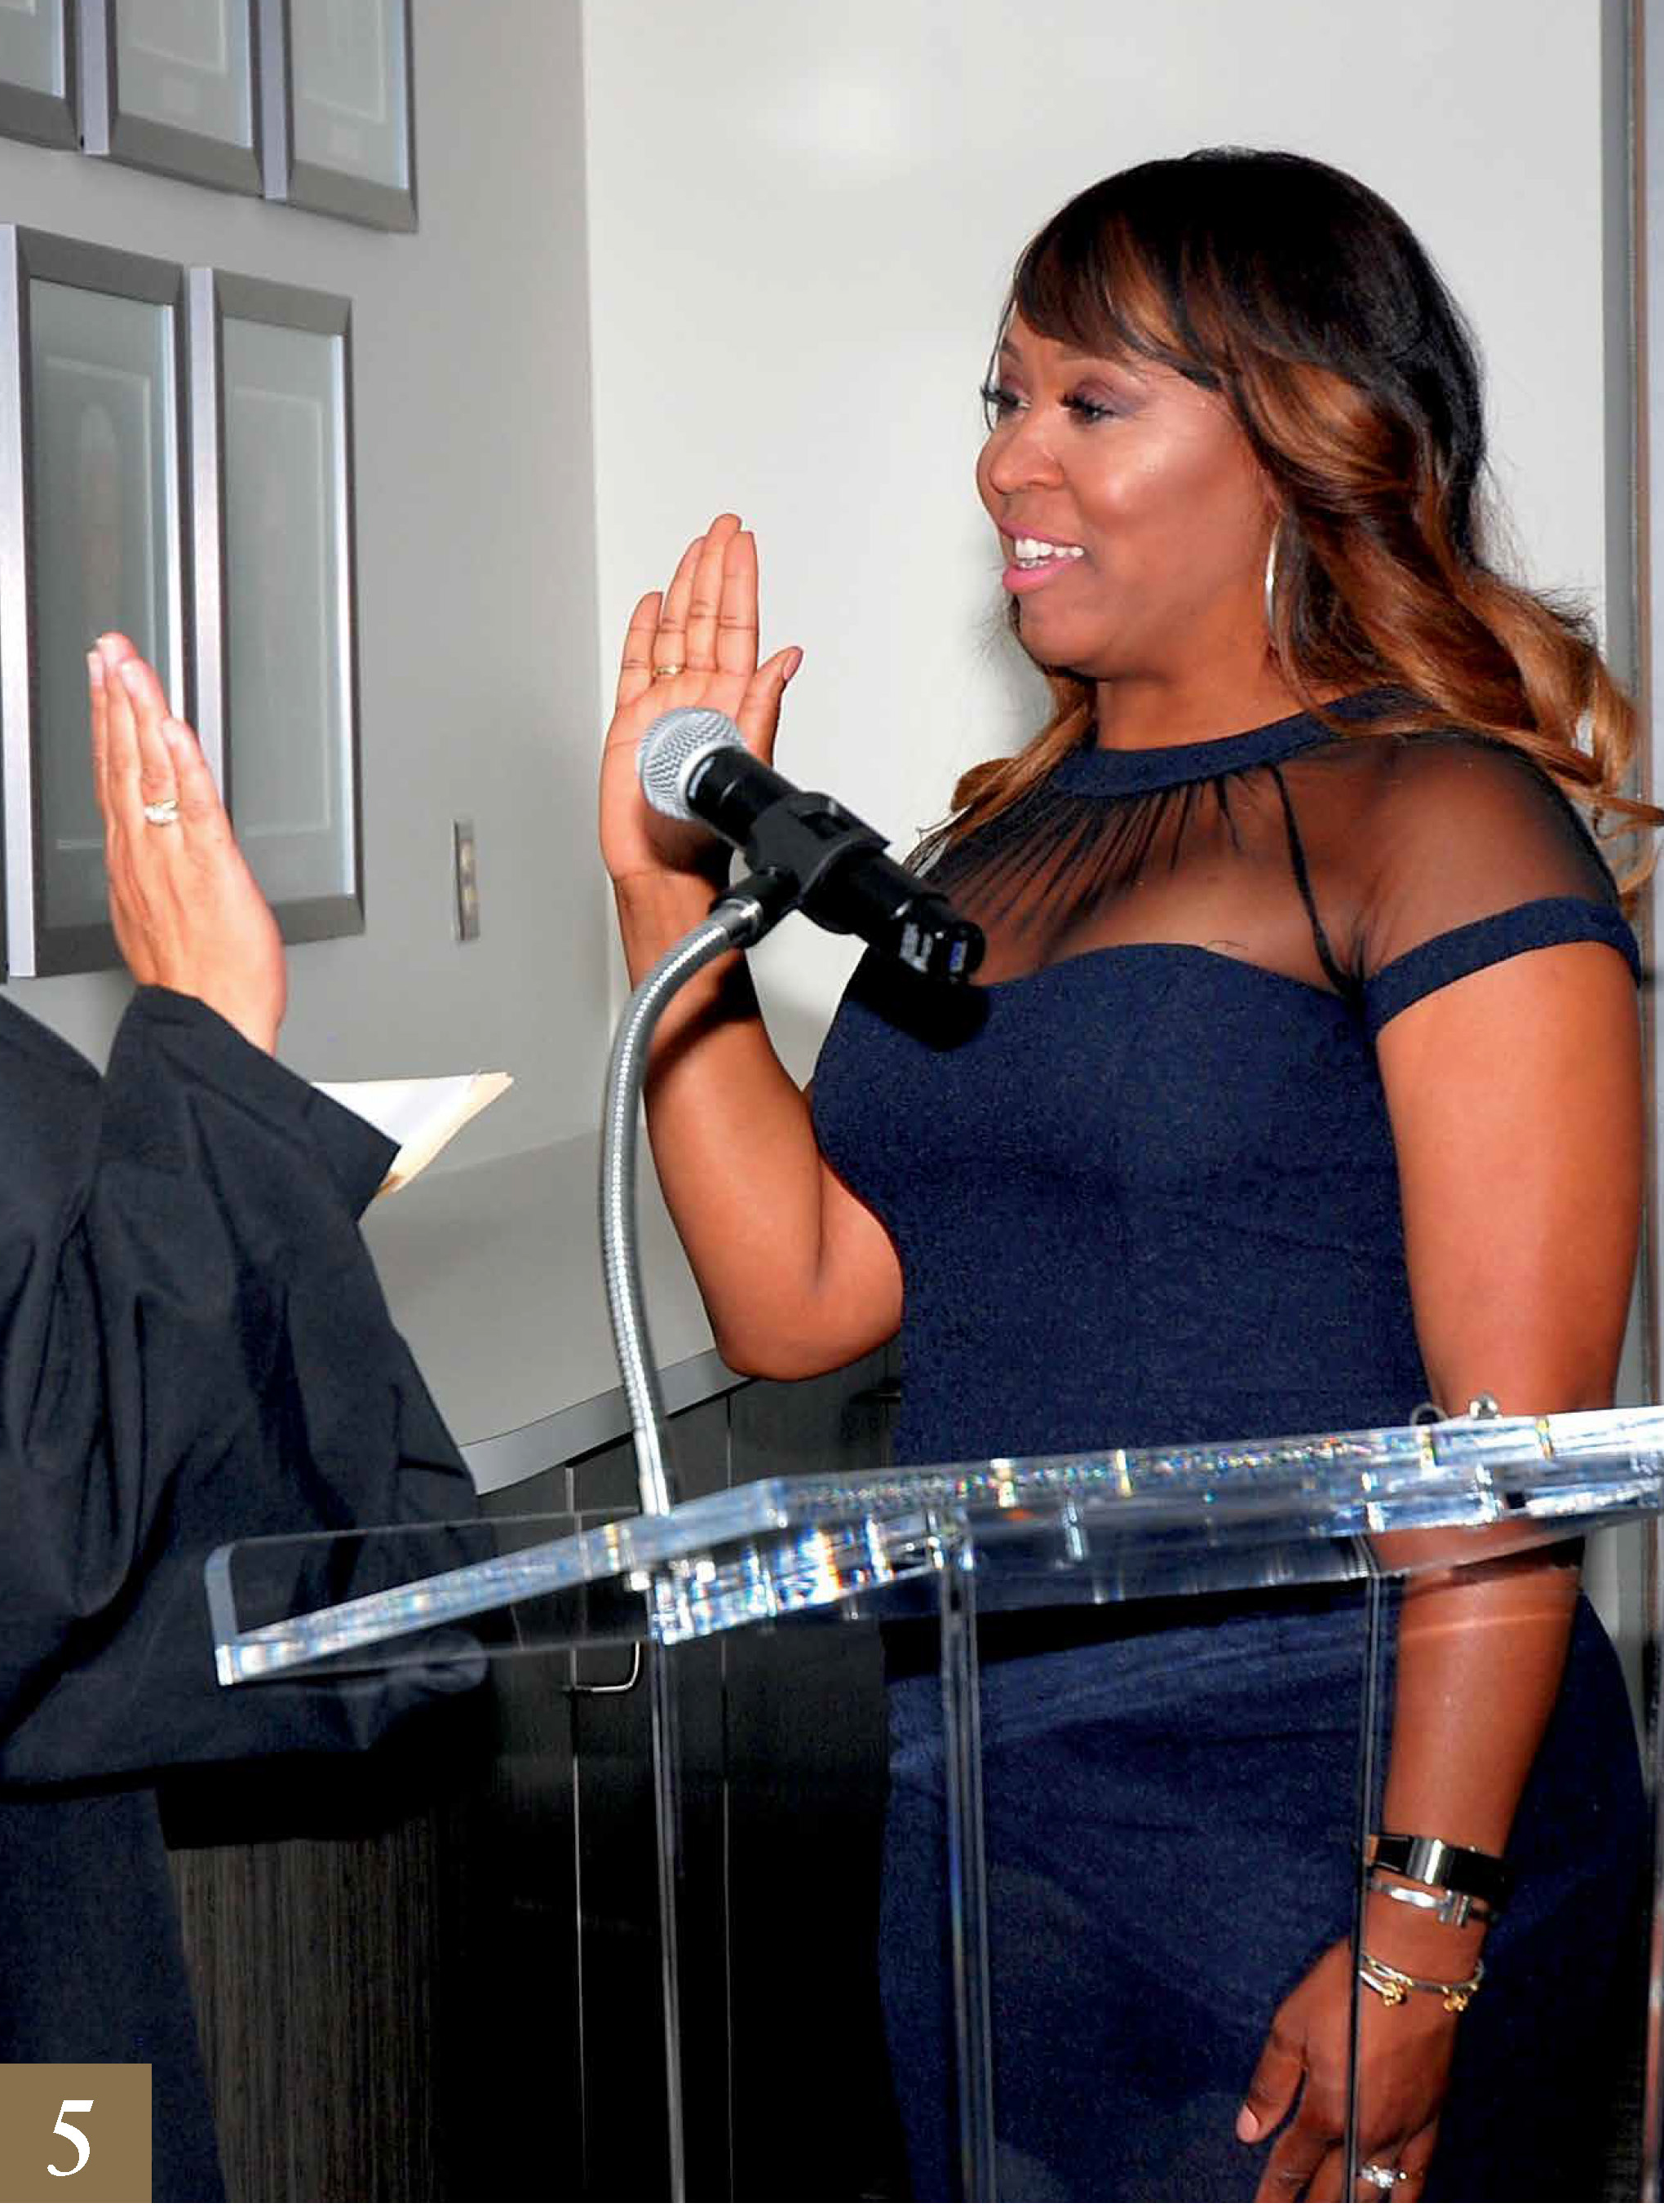 Erica Rouse sworn in as trustee